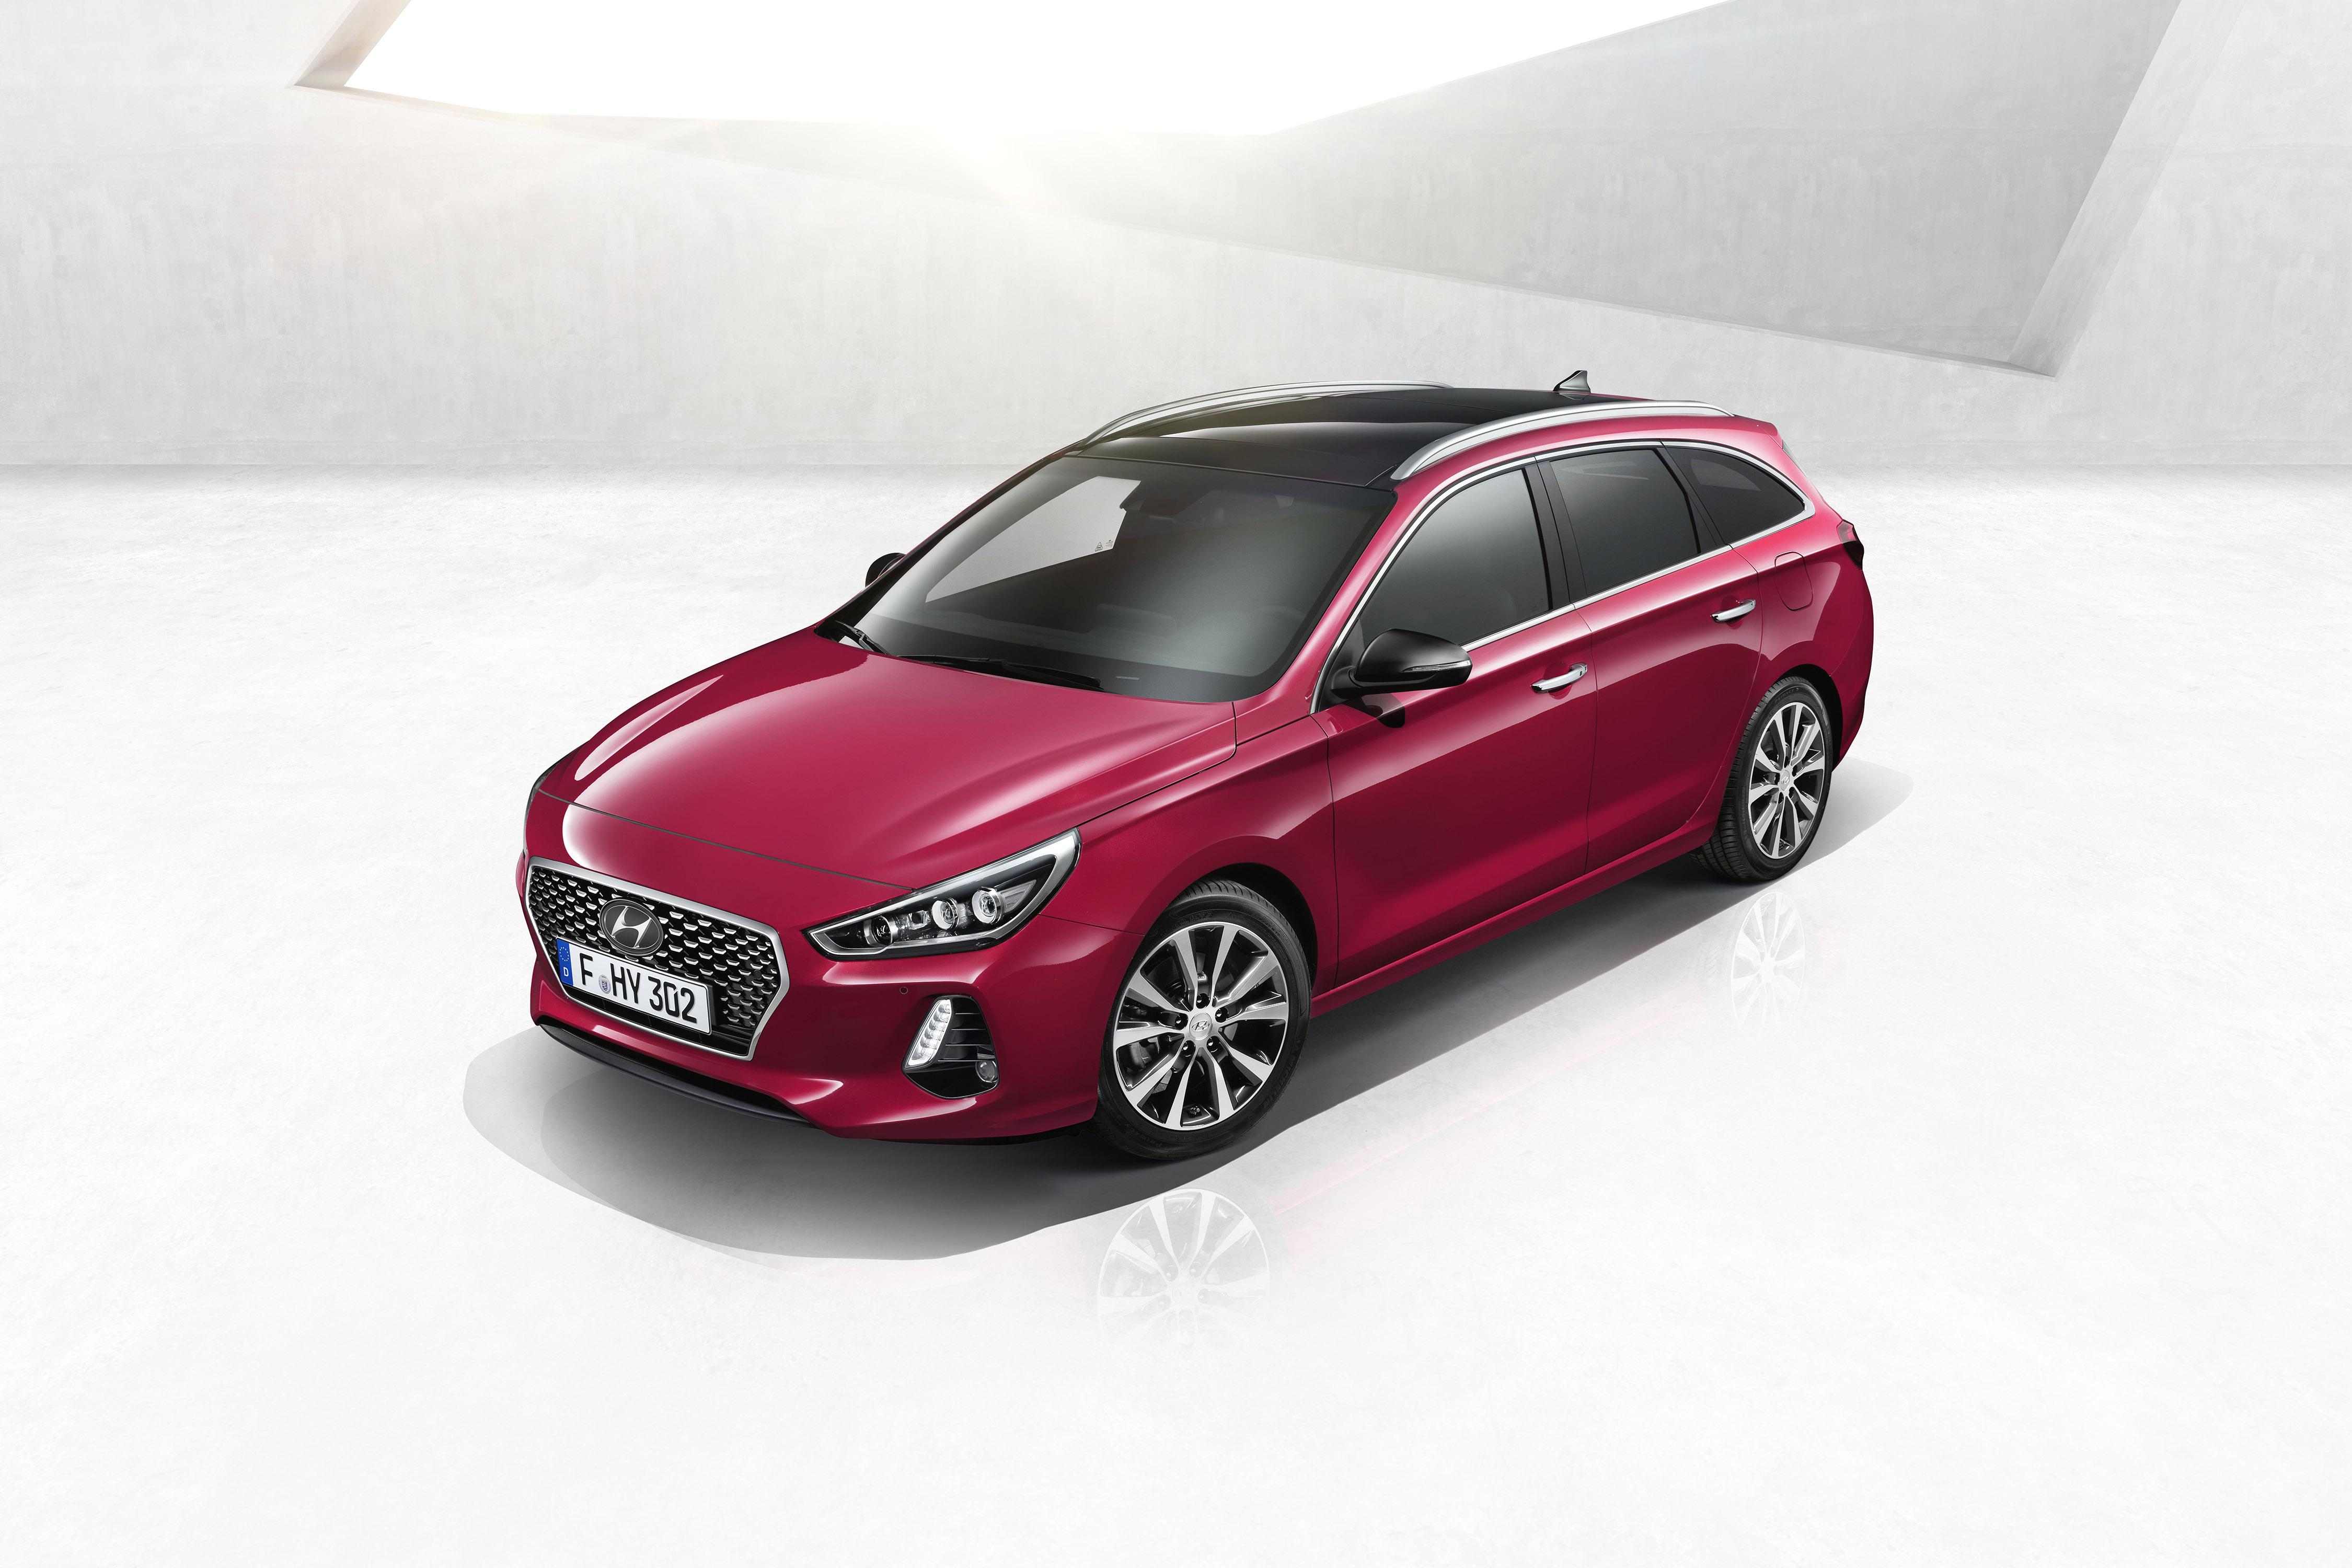 Hyundai i30 Wagon autovisie.nl04-i30-wagon